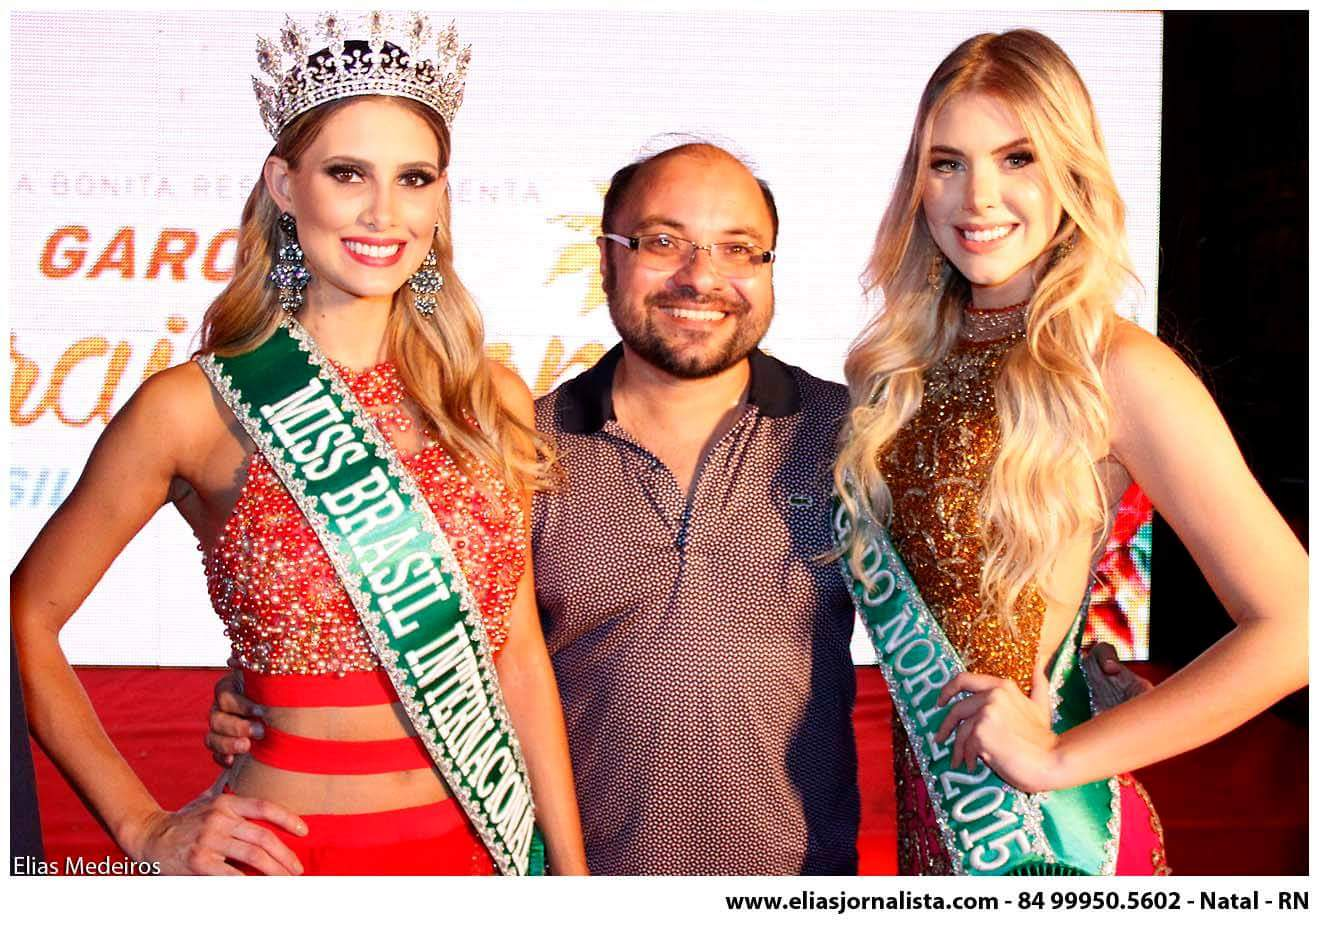 isis stocco, miss brasil internacional 2015. - Página 4 Ozs4w4e6